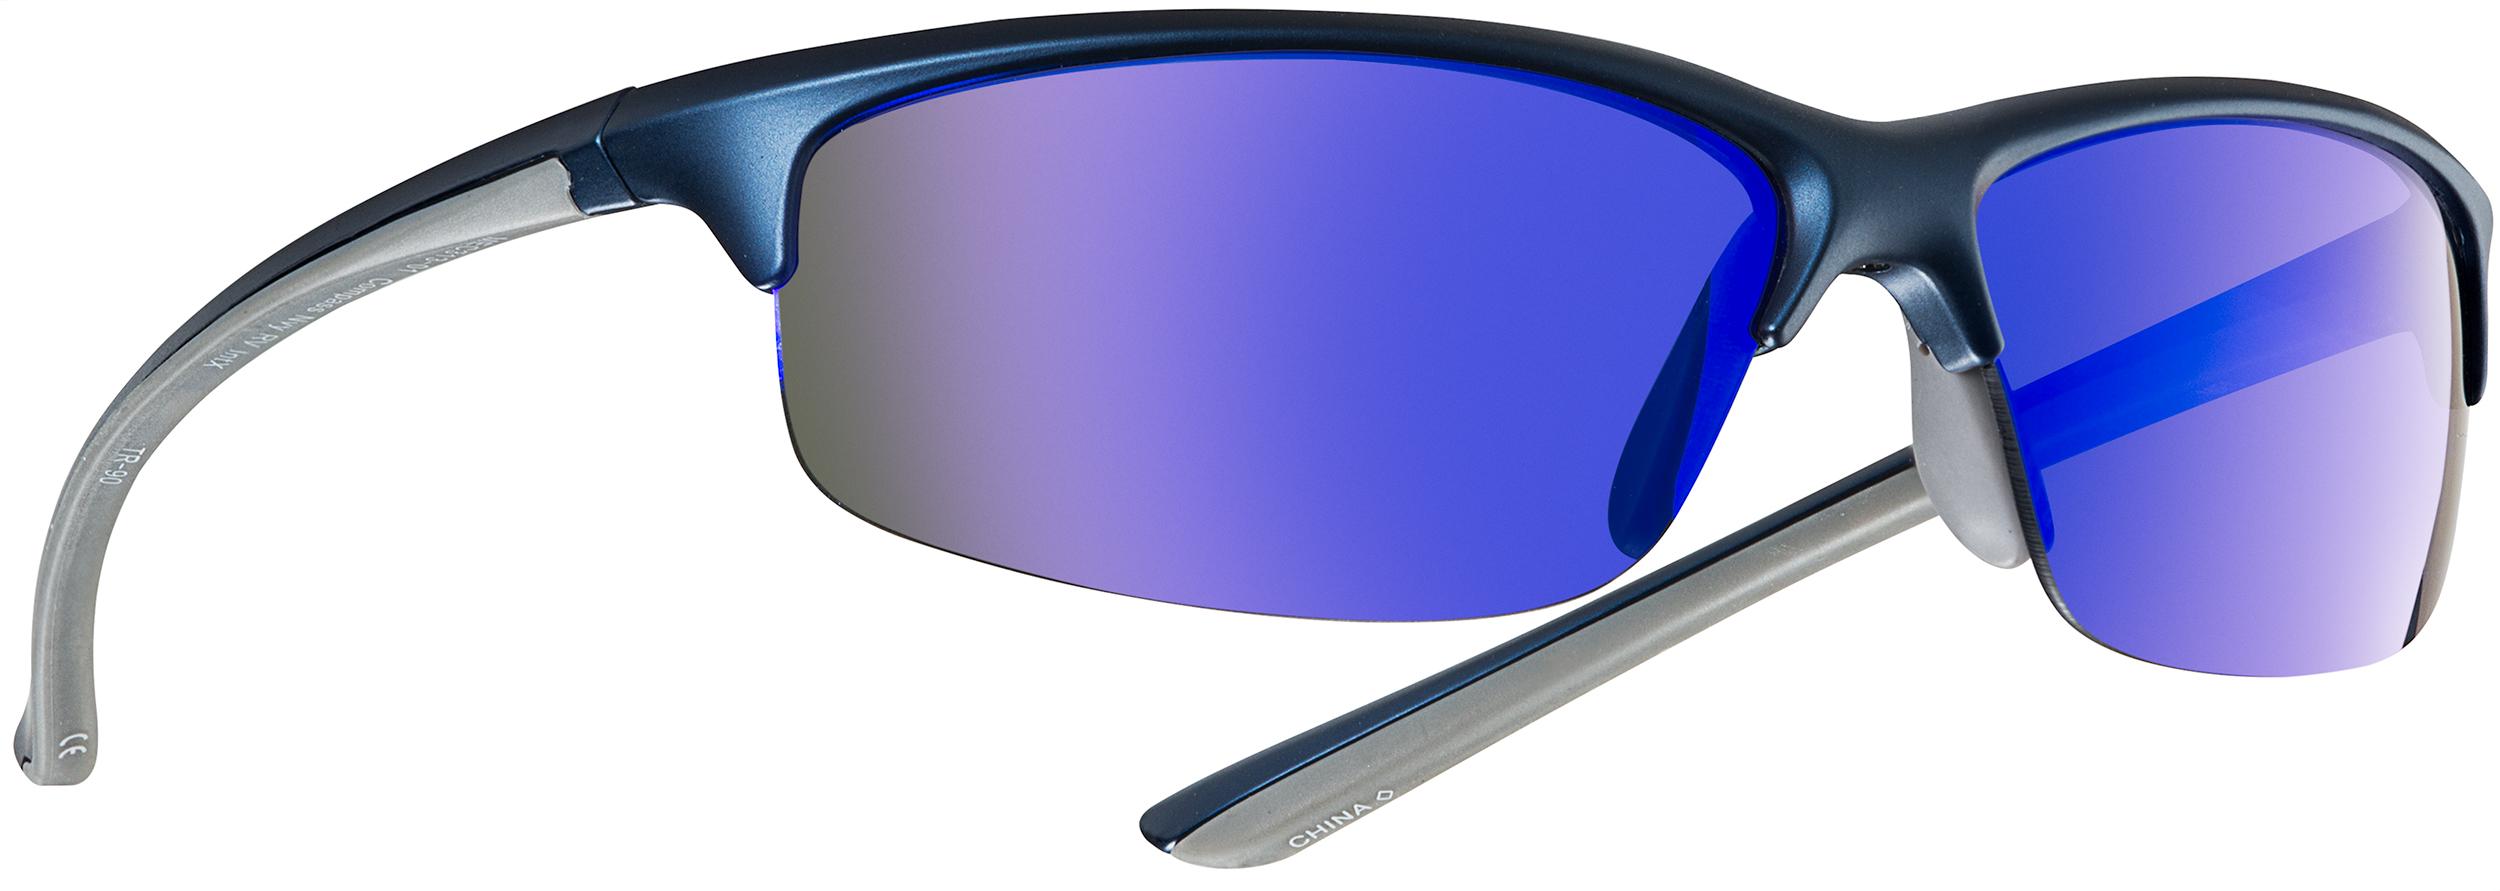 b800af1fab4f Sport sunglasses